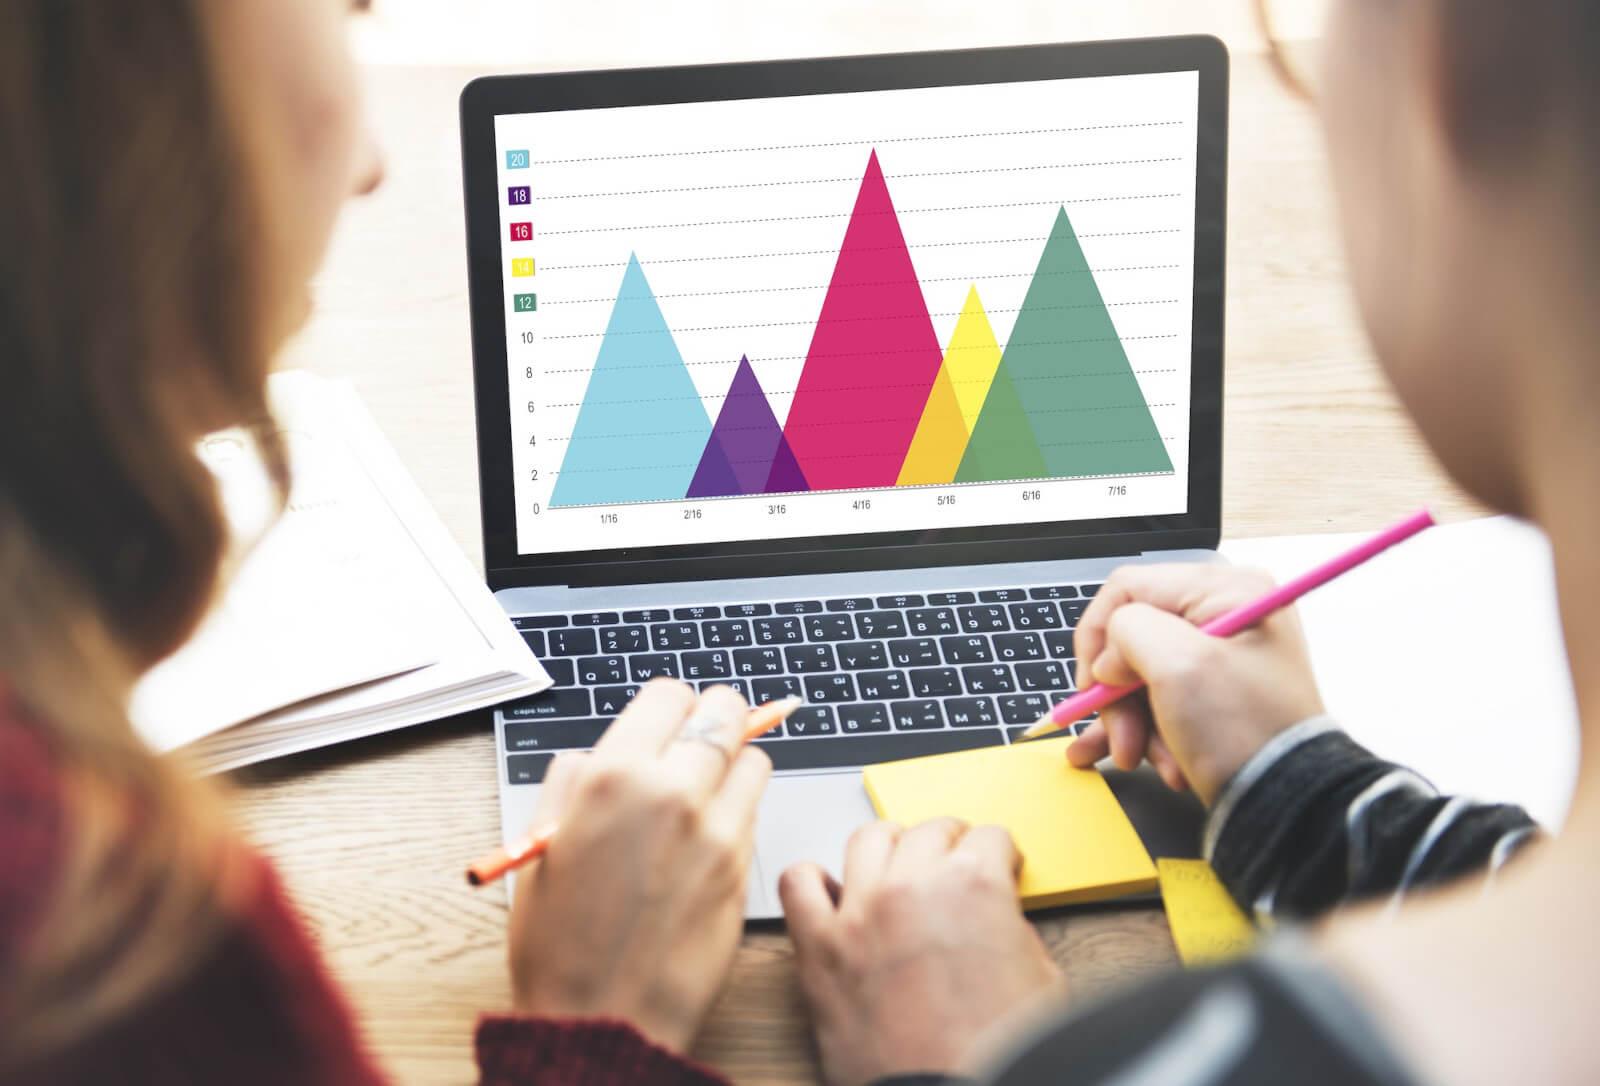 Leadership Resources - how to measure developmental leadership progress